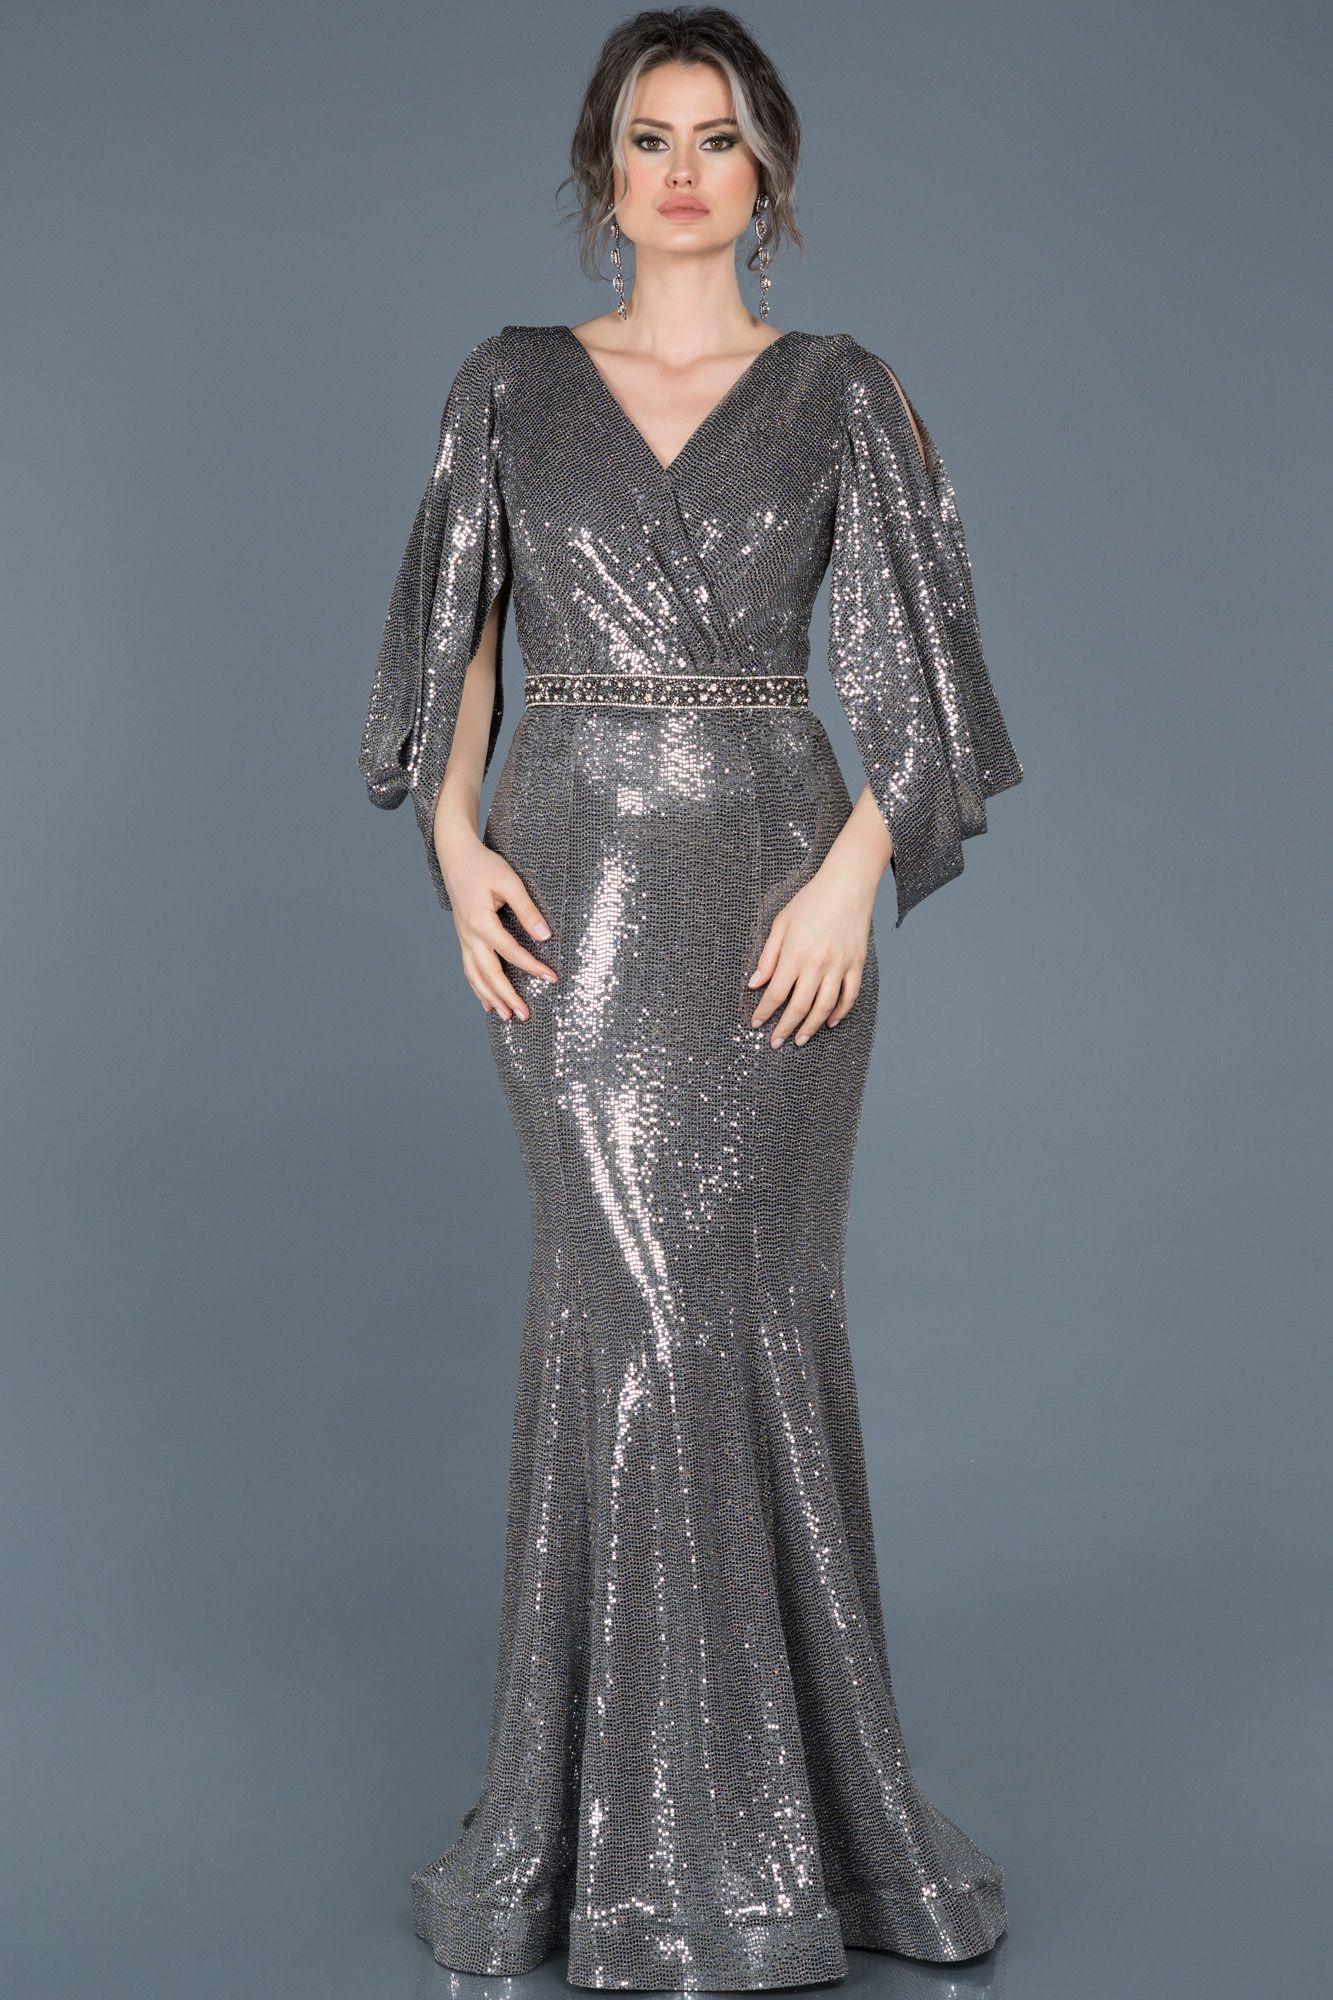 Antrasit Payetli V Yaka Balik Abiye Abu604 Payet Elbise Uzun Elbise Elbise Modelleri